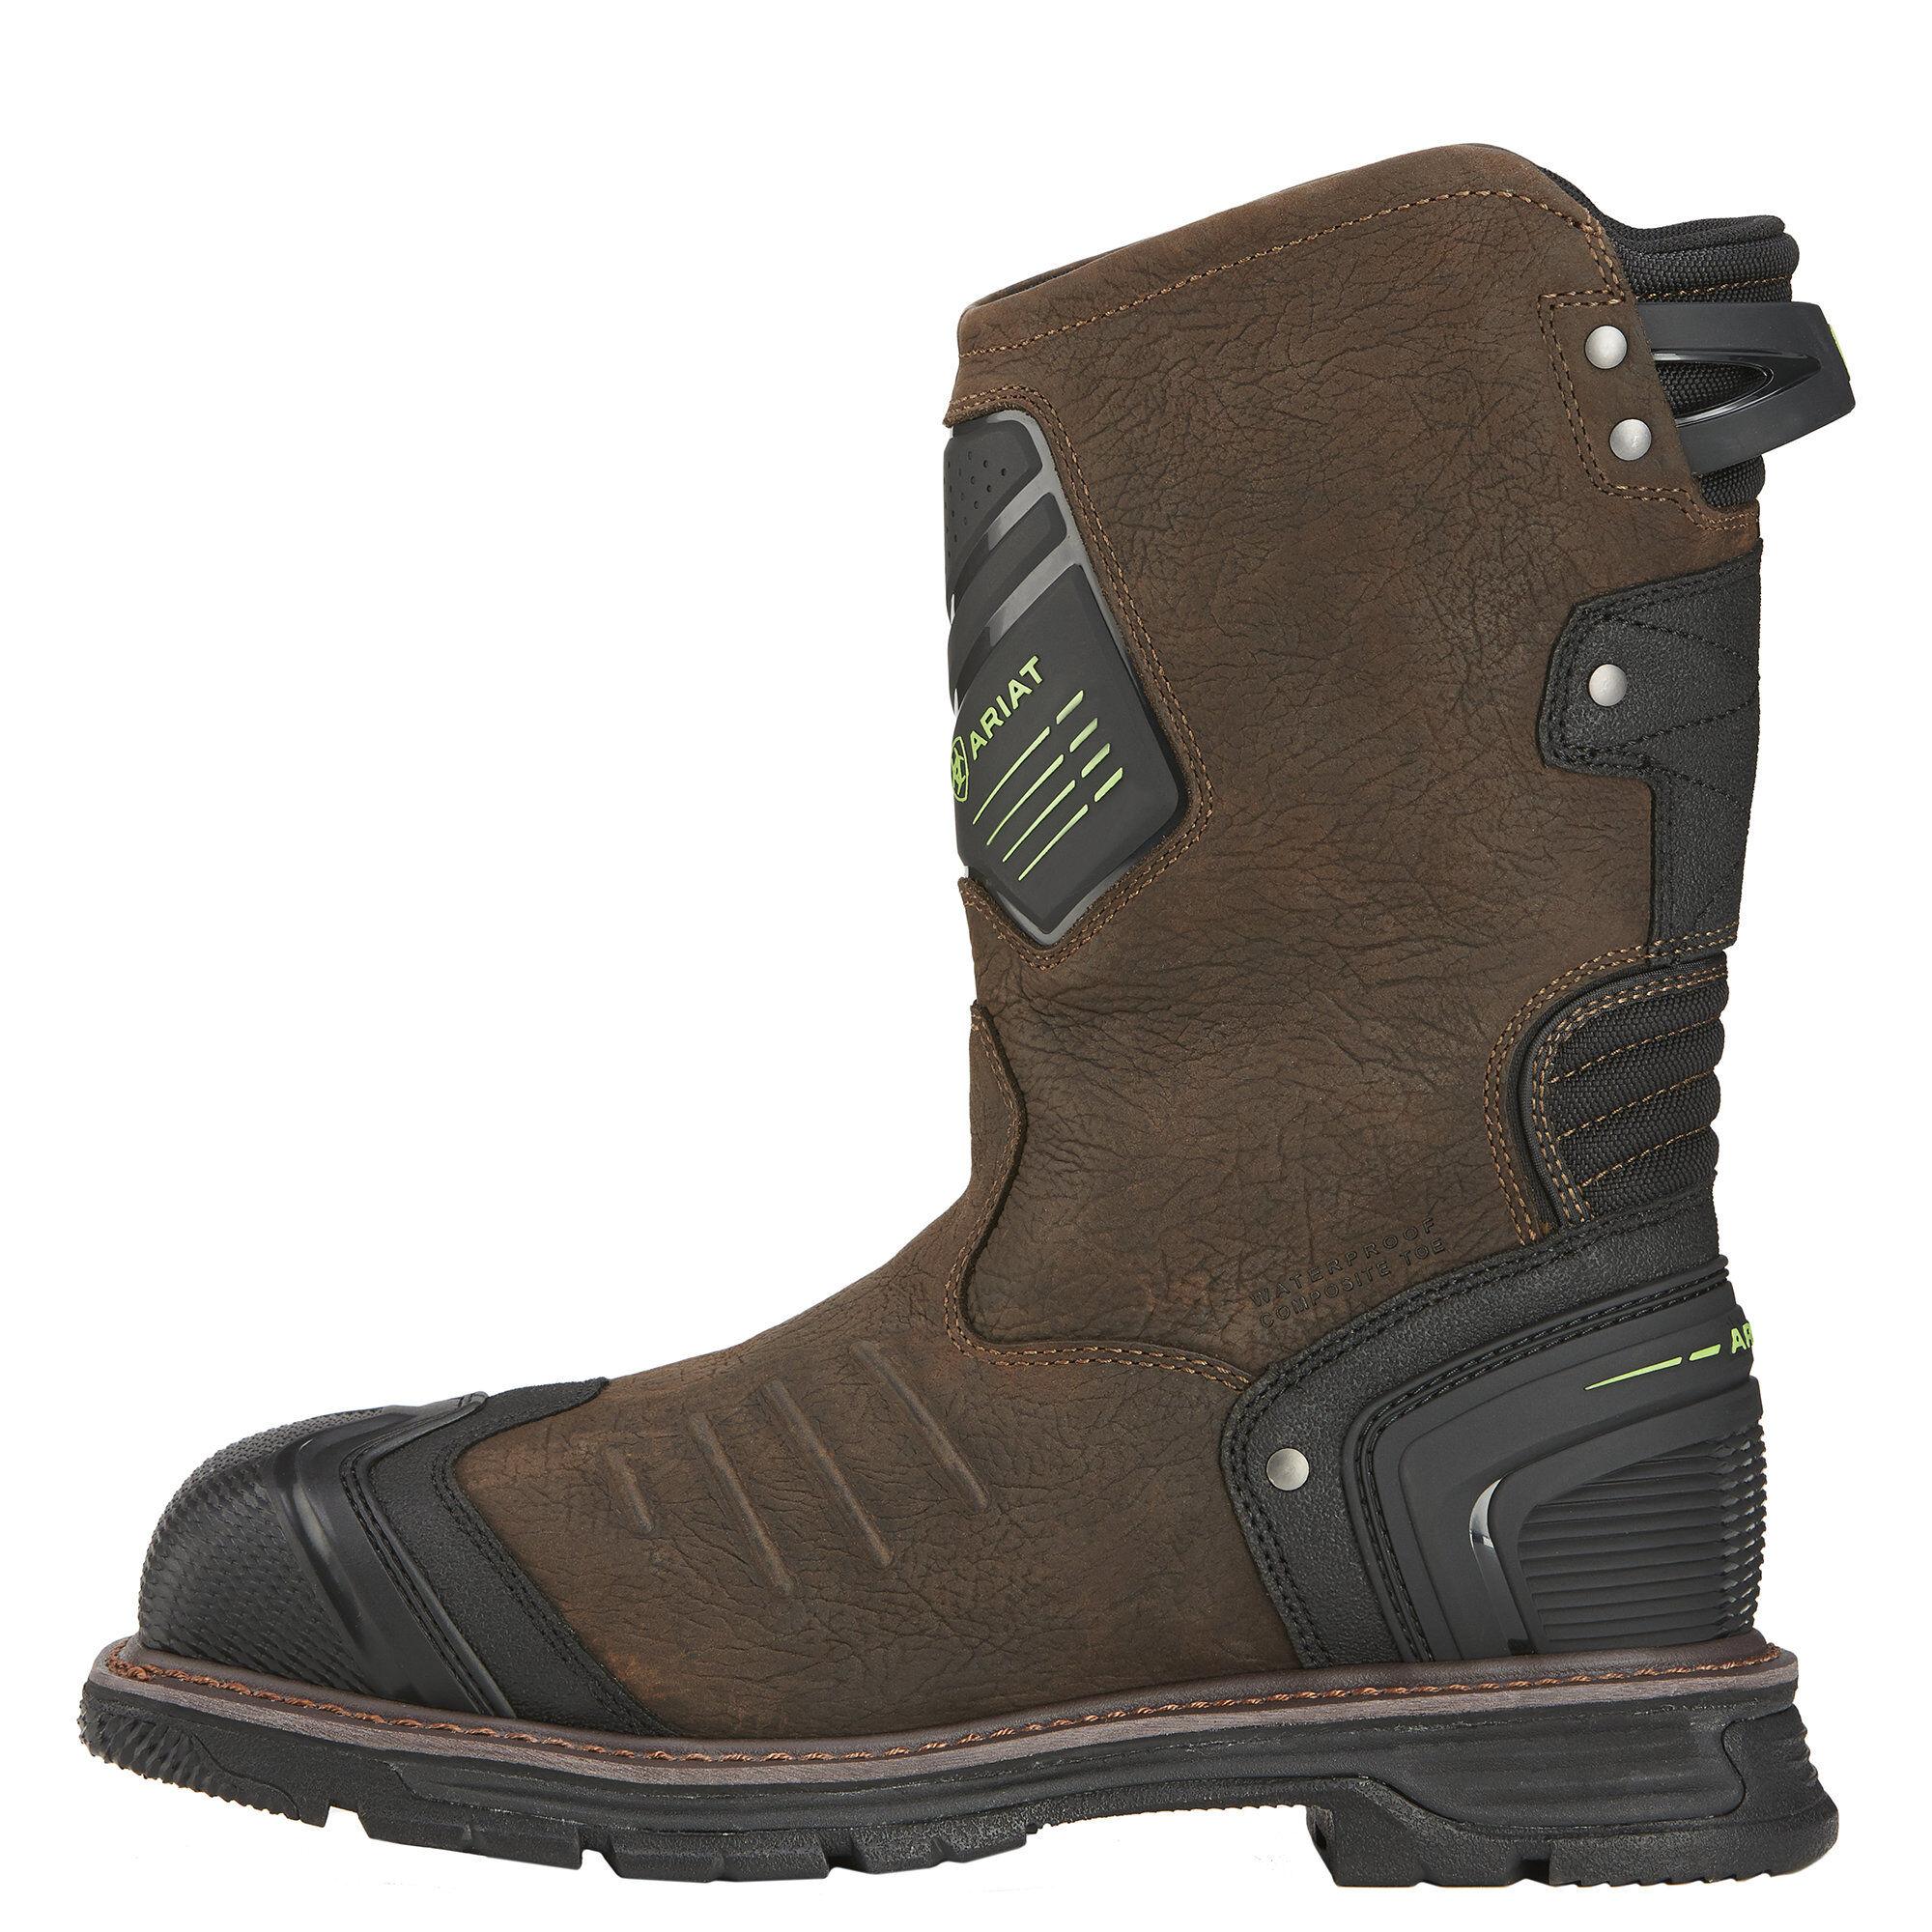 efeec0ed2c8 Catalyst VX Work Wide Square Toe Waterproof Composite Toe Work Boot